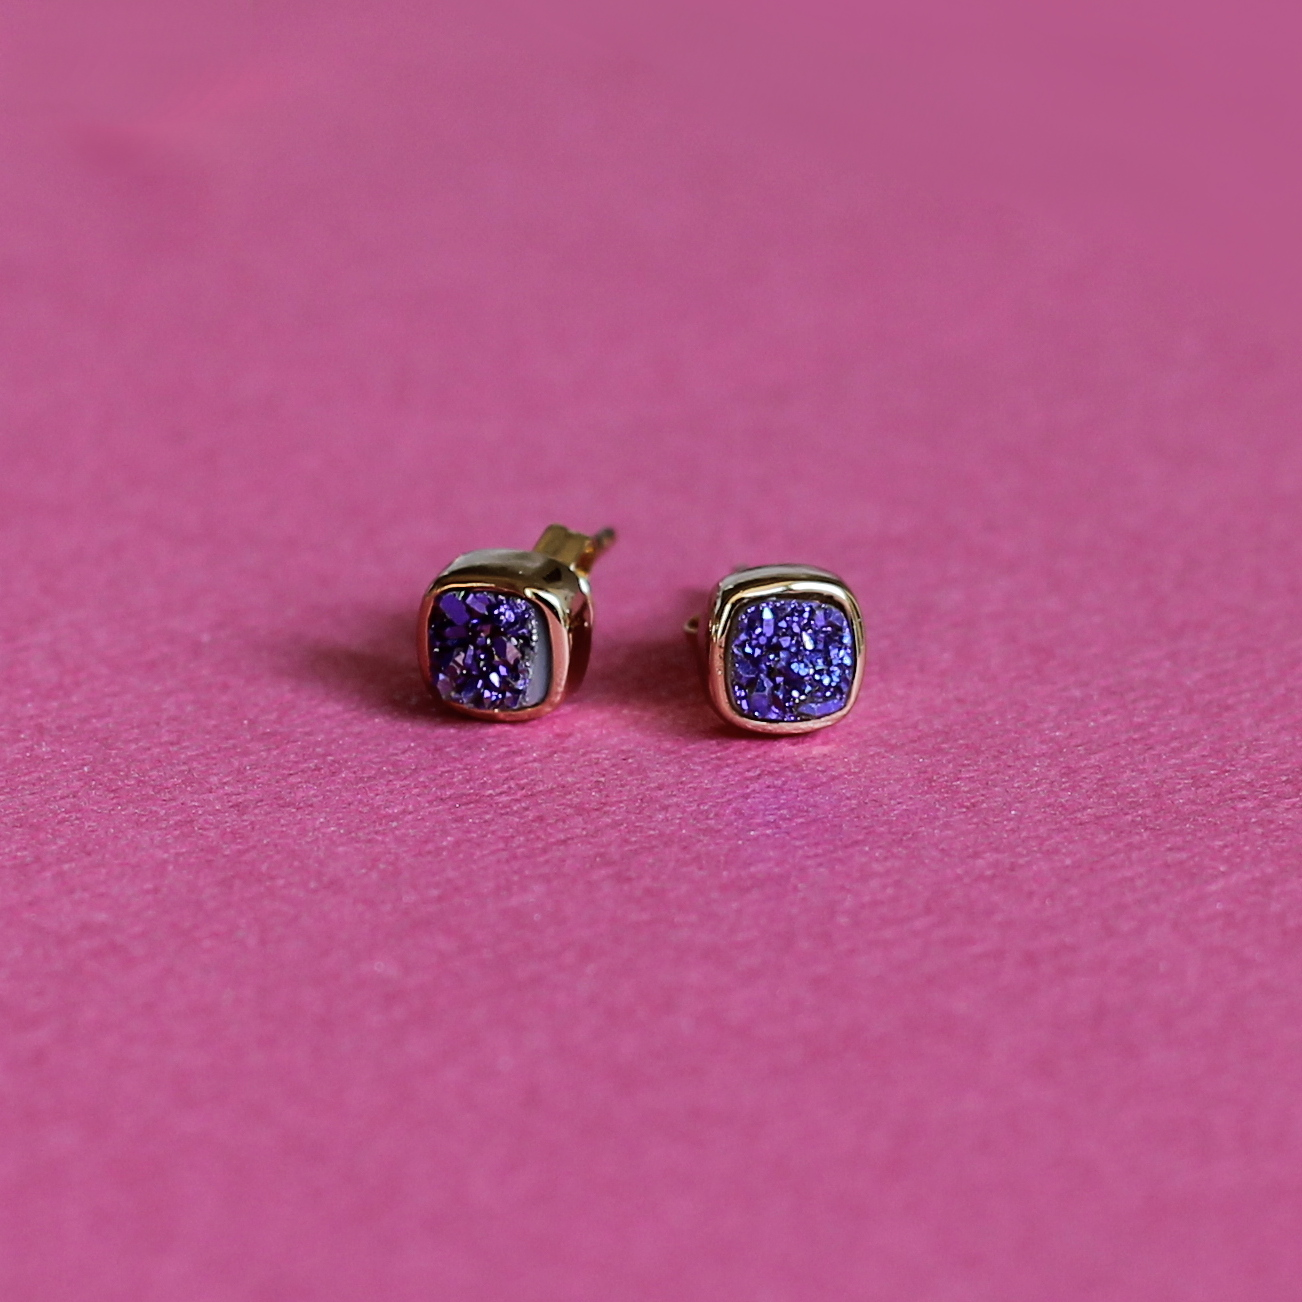 lilac IMG_5082.JPG